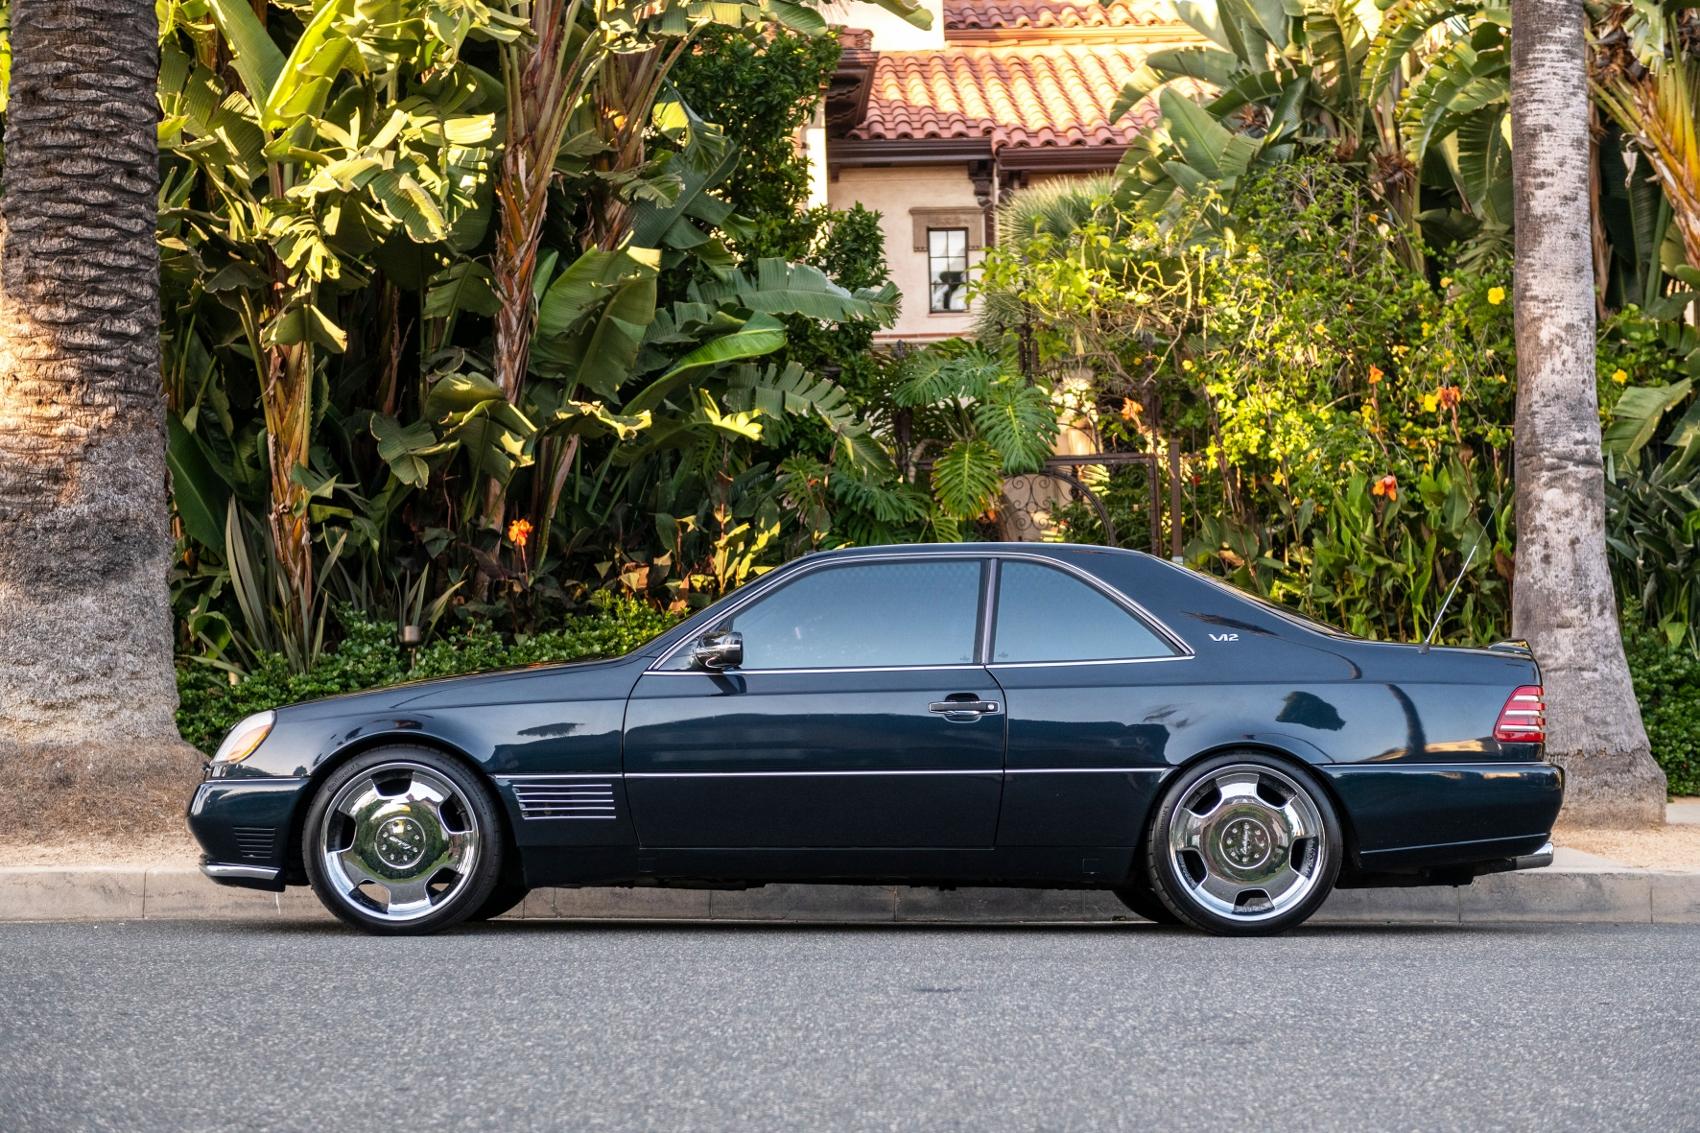 Pozrite si Mercedes S600 Michaela Jordana z roku 1996 iaL33uI2Aw lorinsercl600ex-jordanside2sbeverly